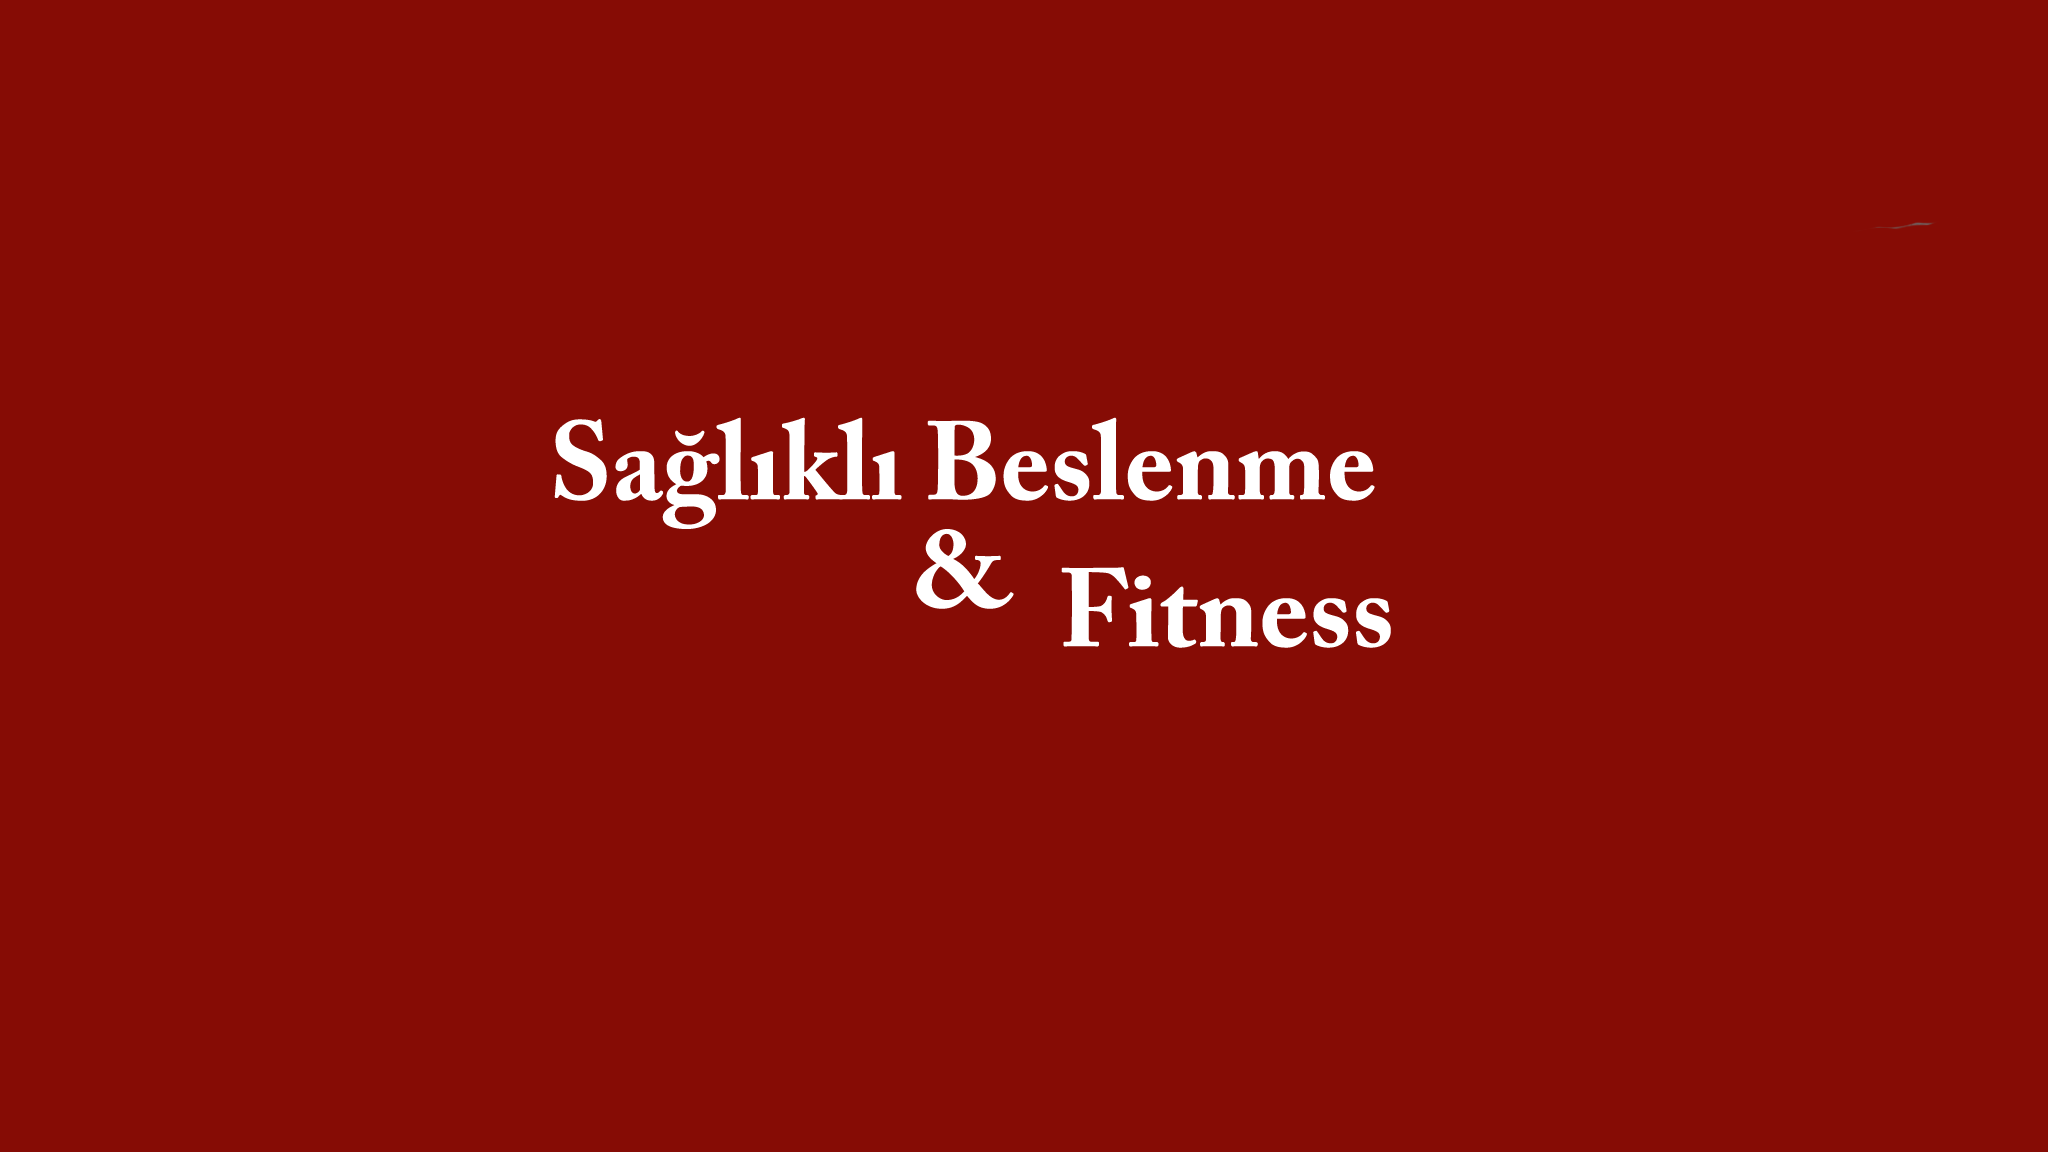 Sağlıklı Beslenme ve Fitness